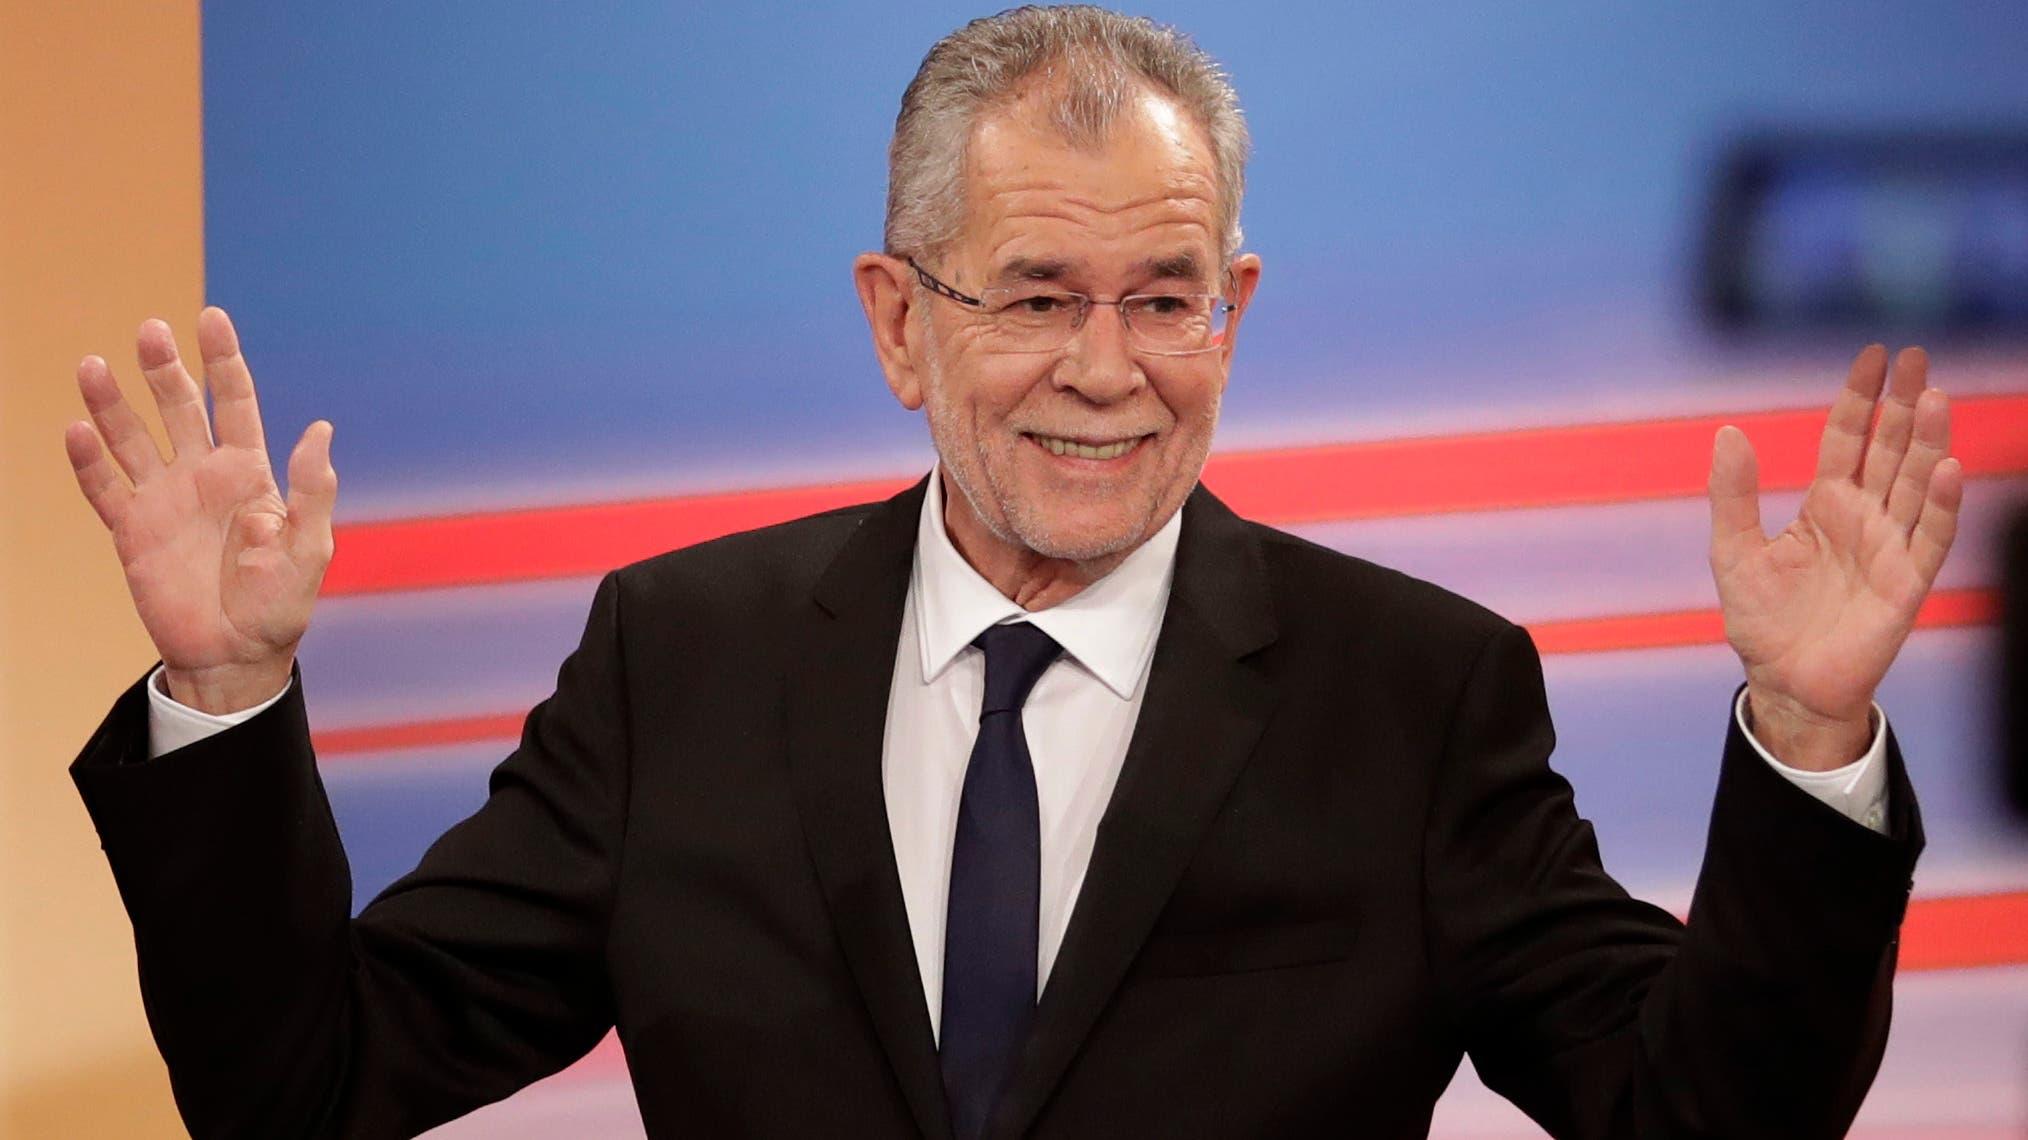 Wahl des Bundespräsidenten in Österreich: Alexander Van der Bellen gegen Norbert Hofer